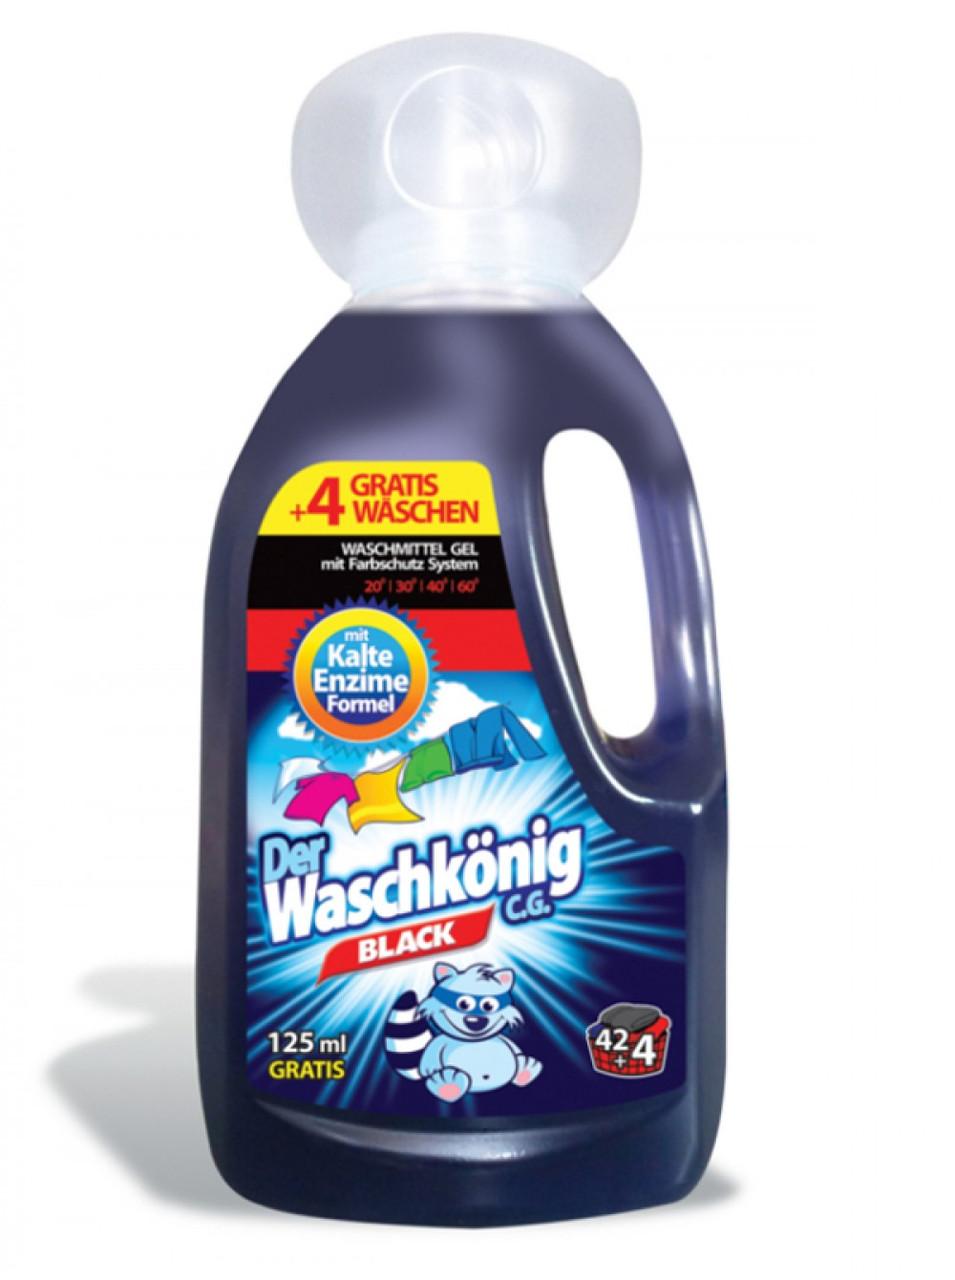 Гель для прання темних речей Der Waschkonig Black 1.625 мл.